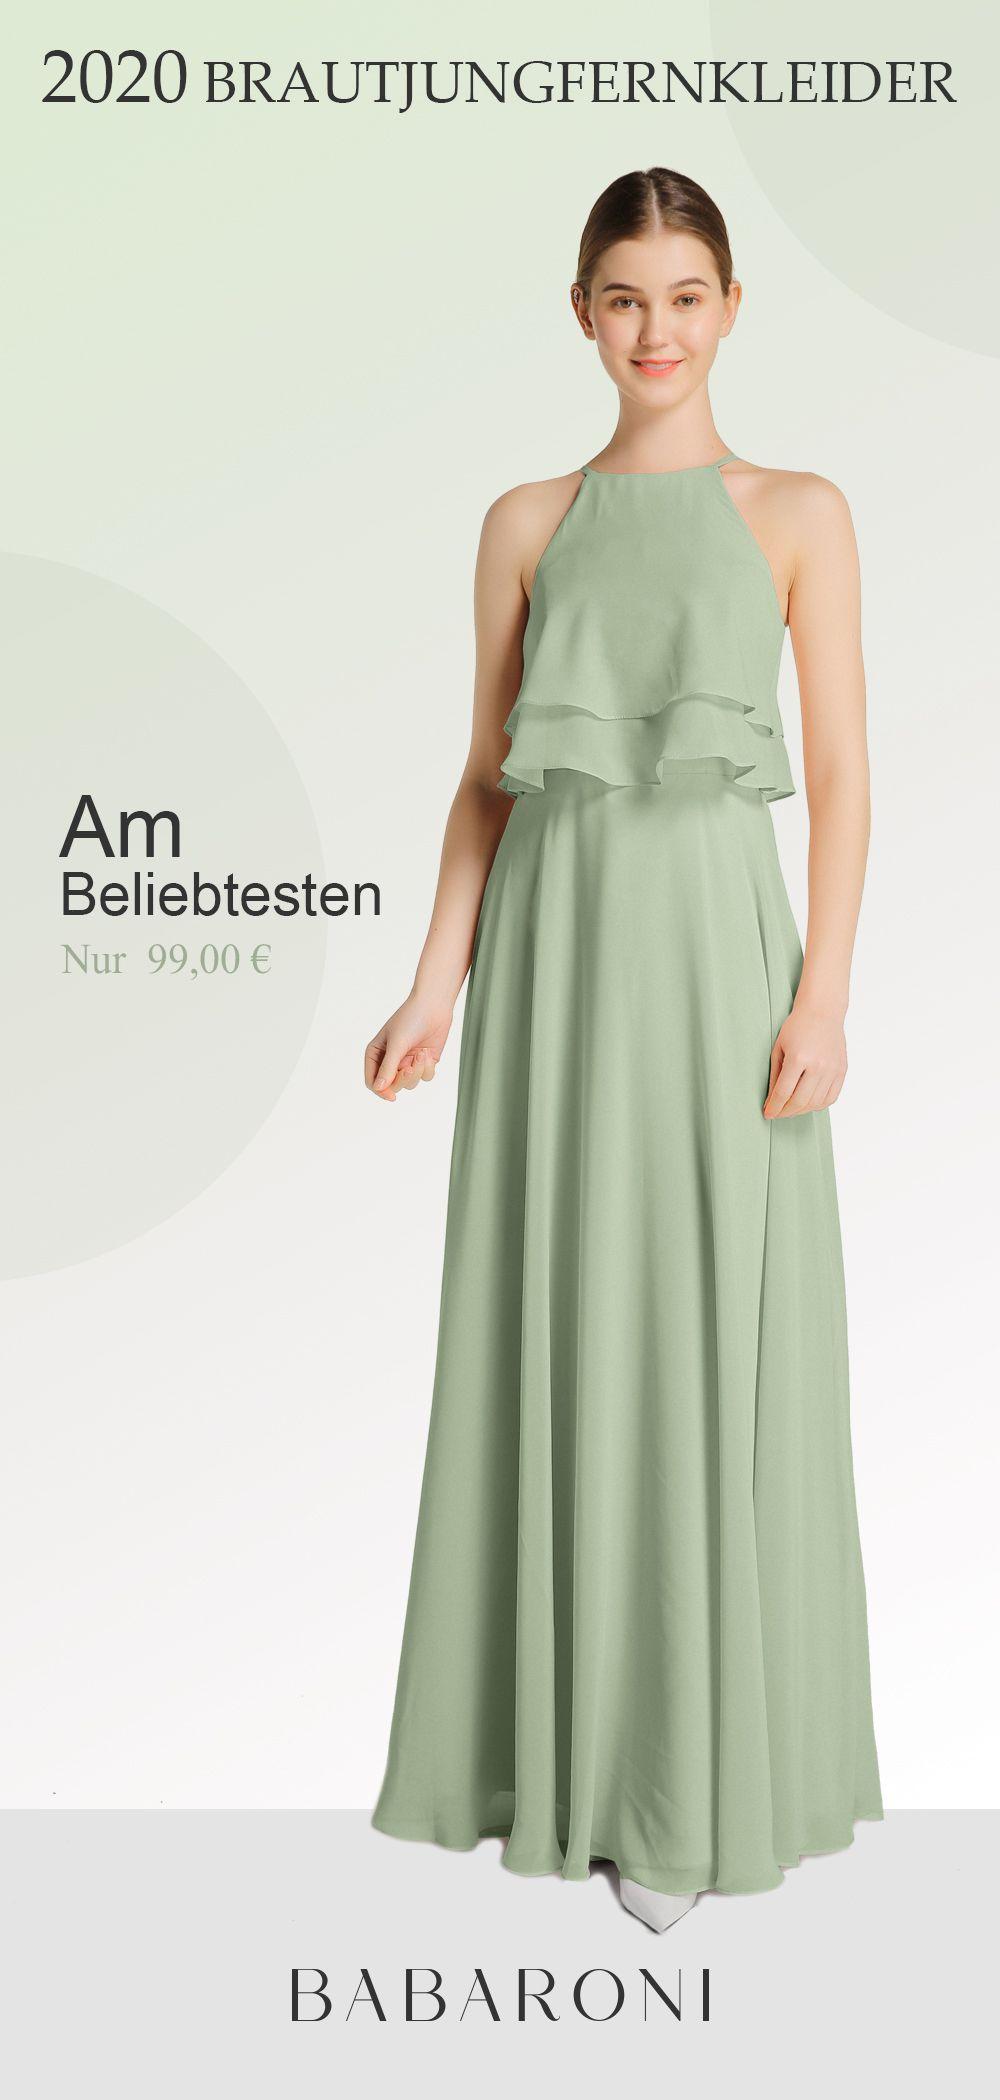 Babaroni Aveline In 2020 Brautjungfernkleid Kleider Langes Brautjungfernkleid